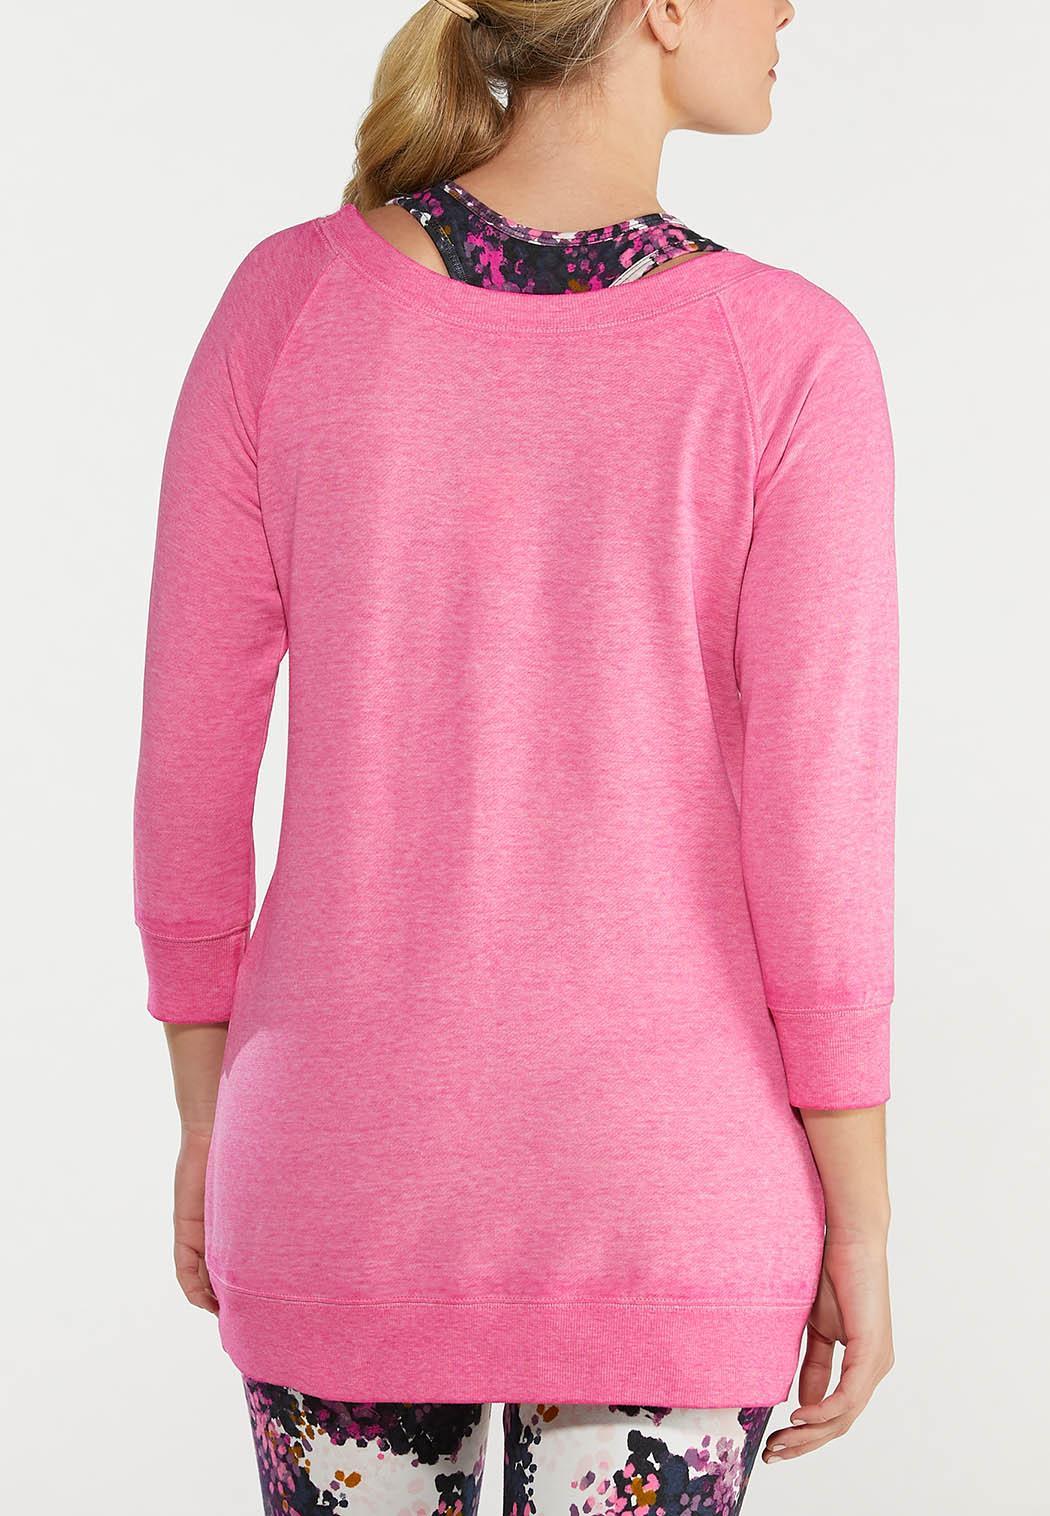 Plus Size Solid Brushed Color Sweatshirt (Item #44567568)